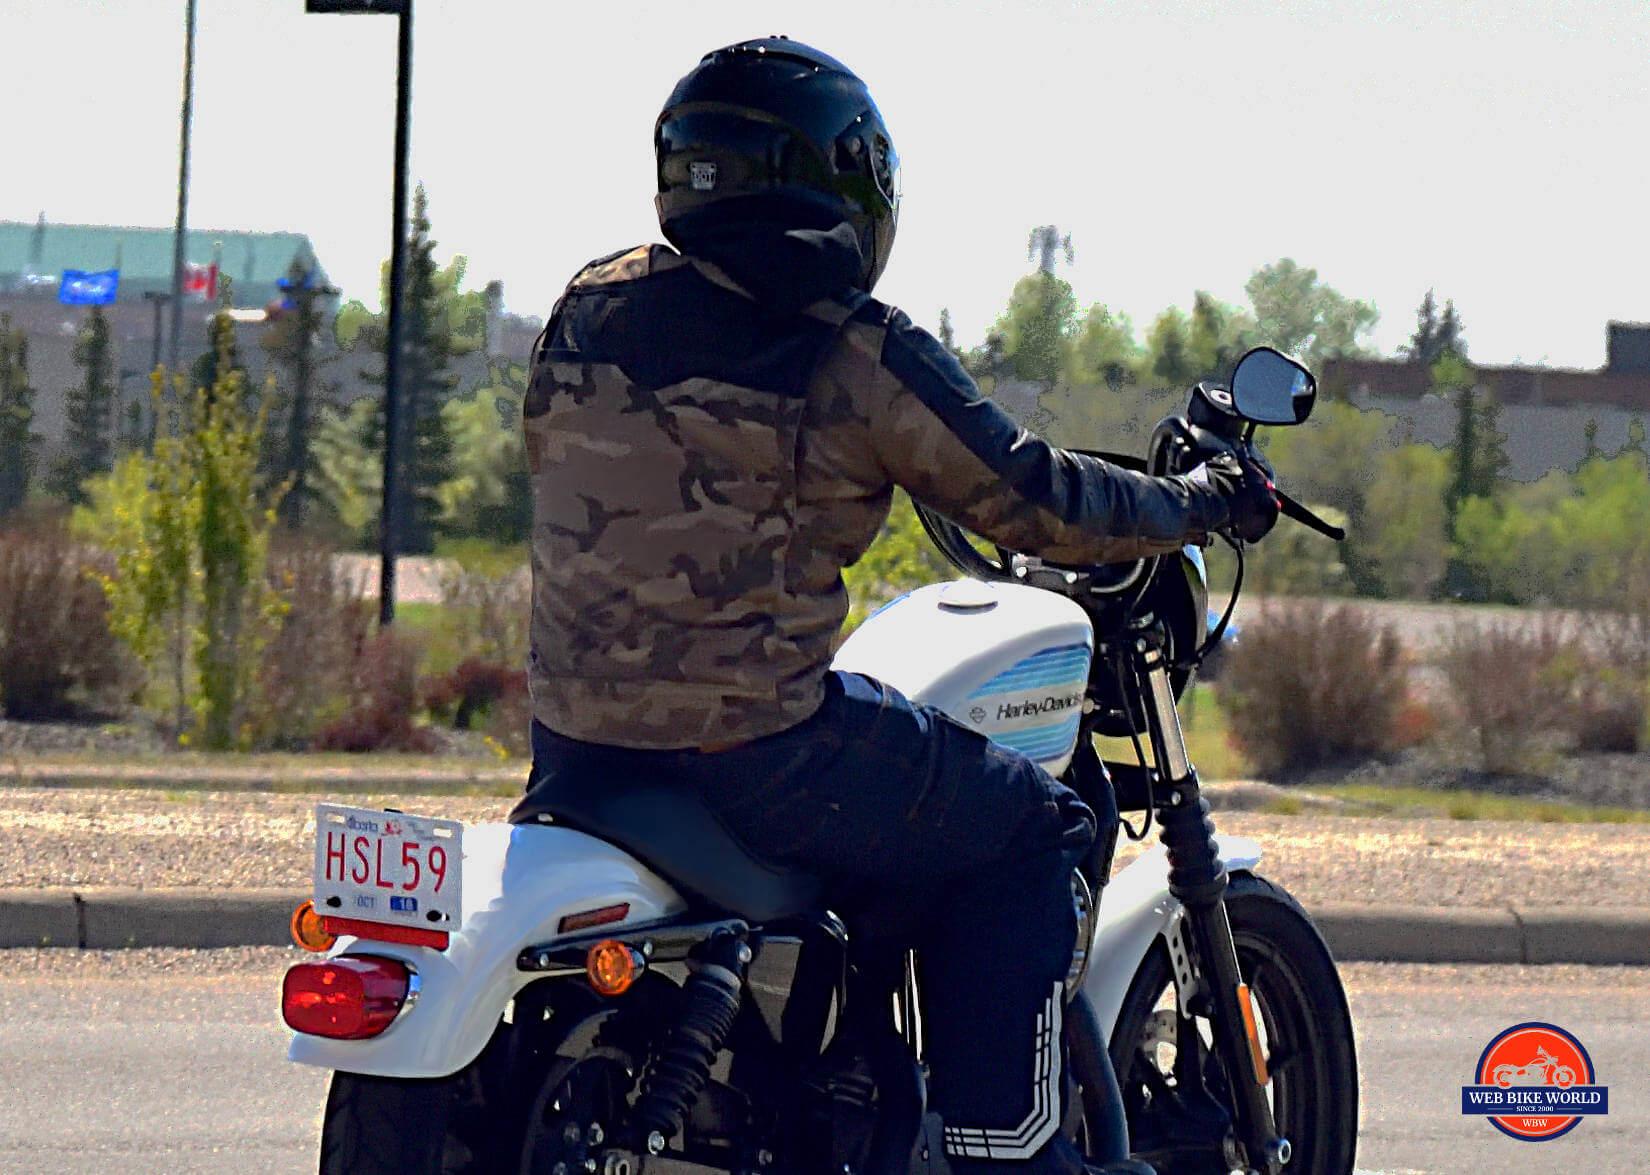 Clymer Repair Manual Image Gallery. Rider in Camo on top Harley Davidson  Motorcycle